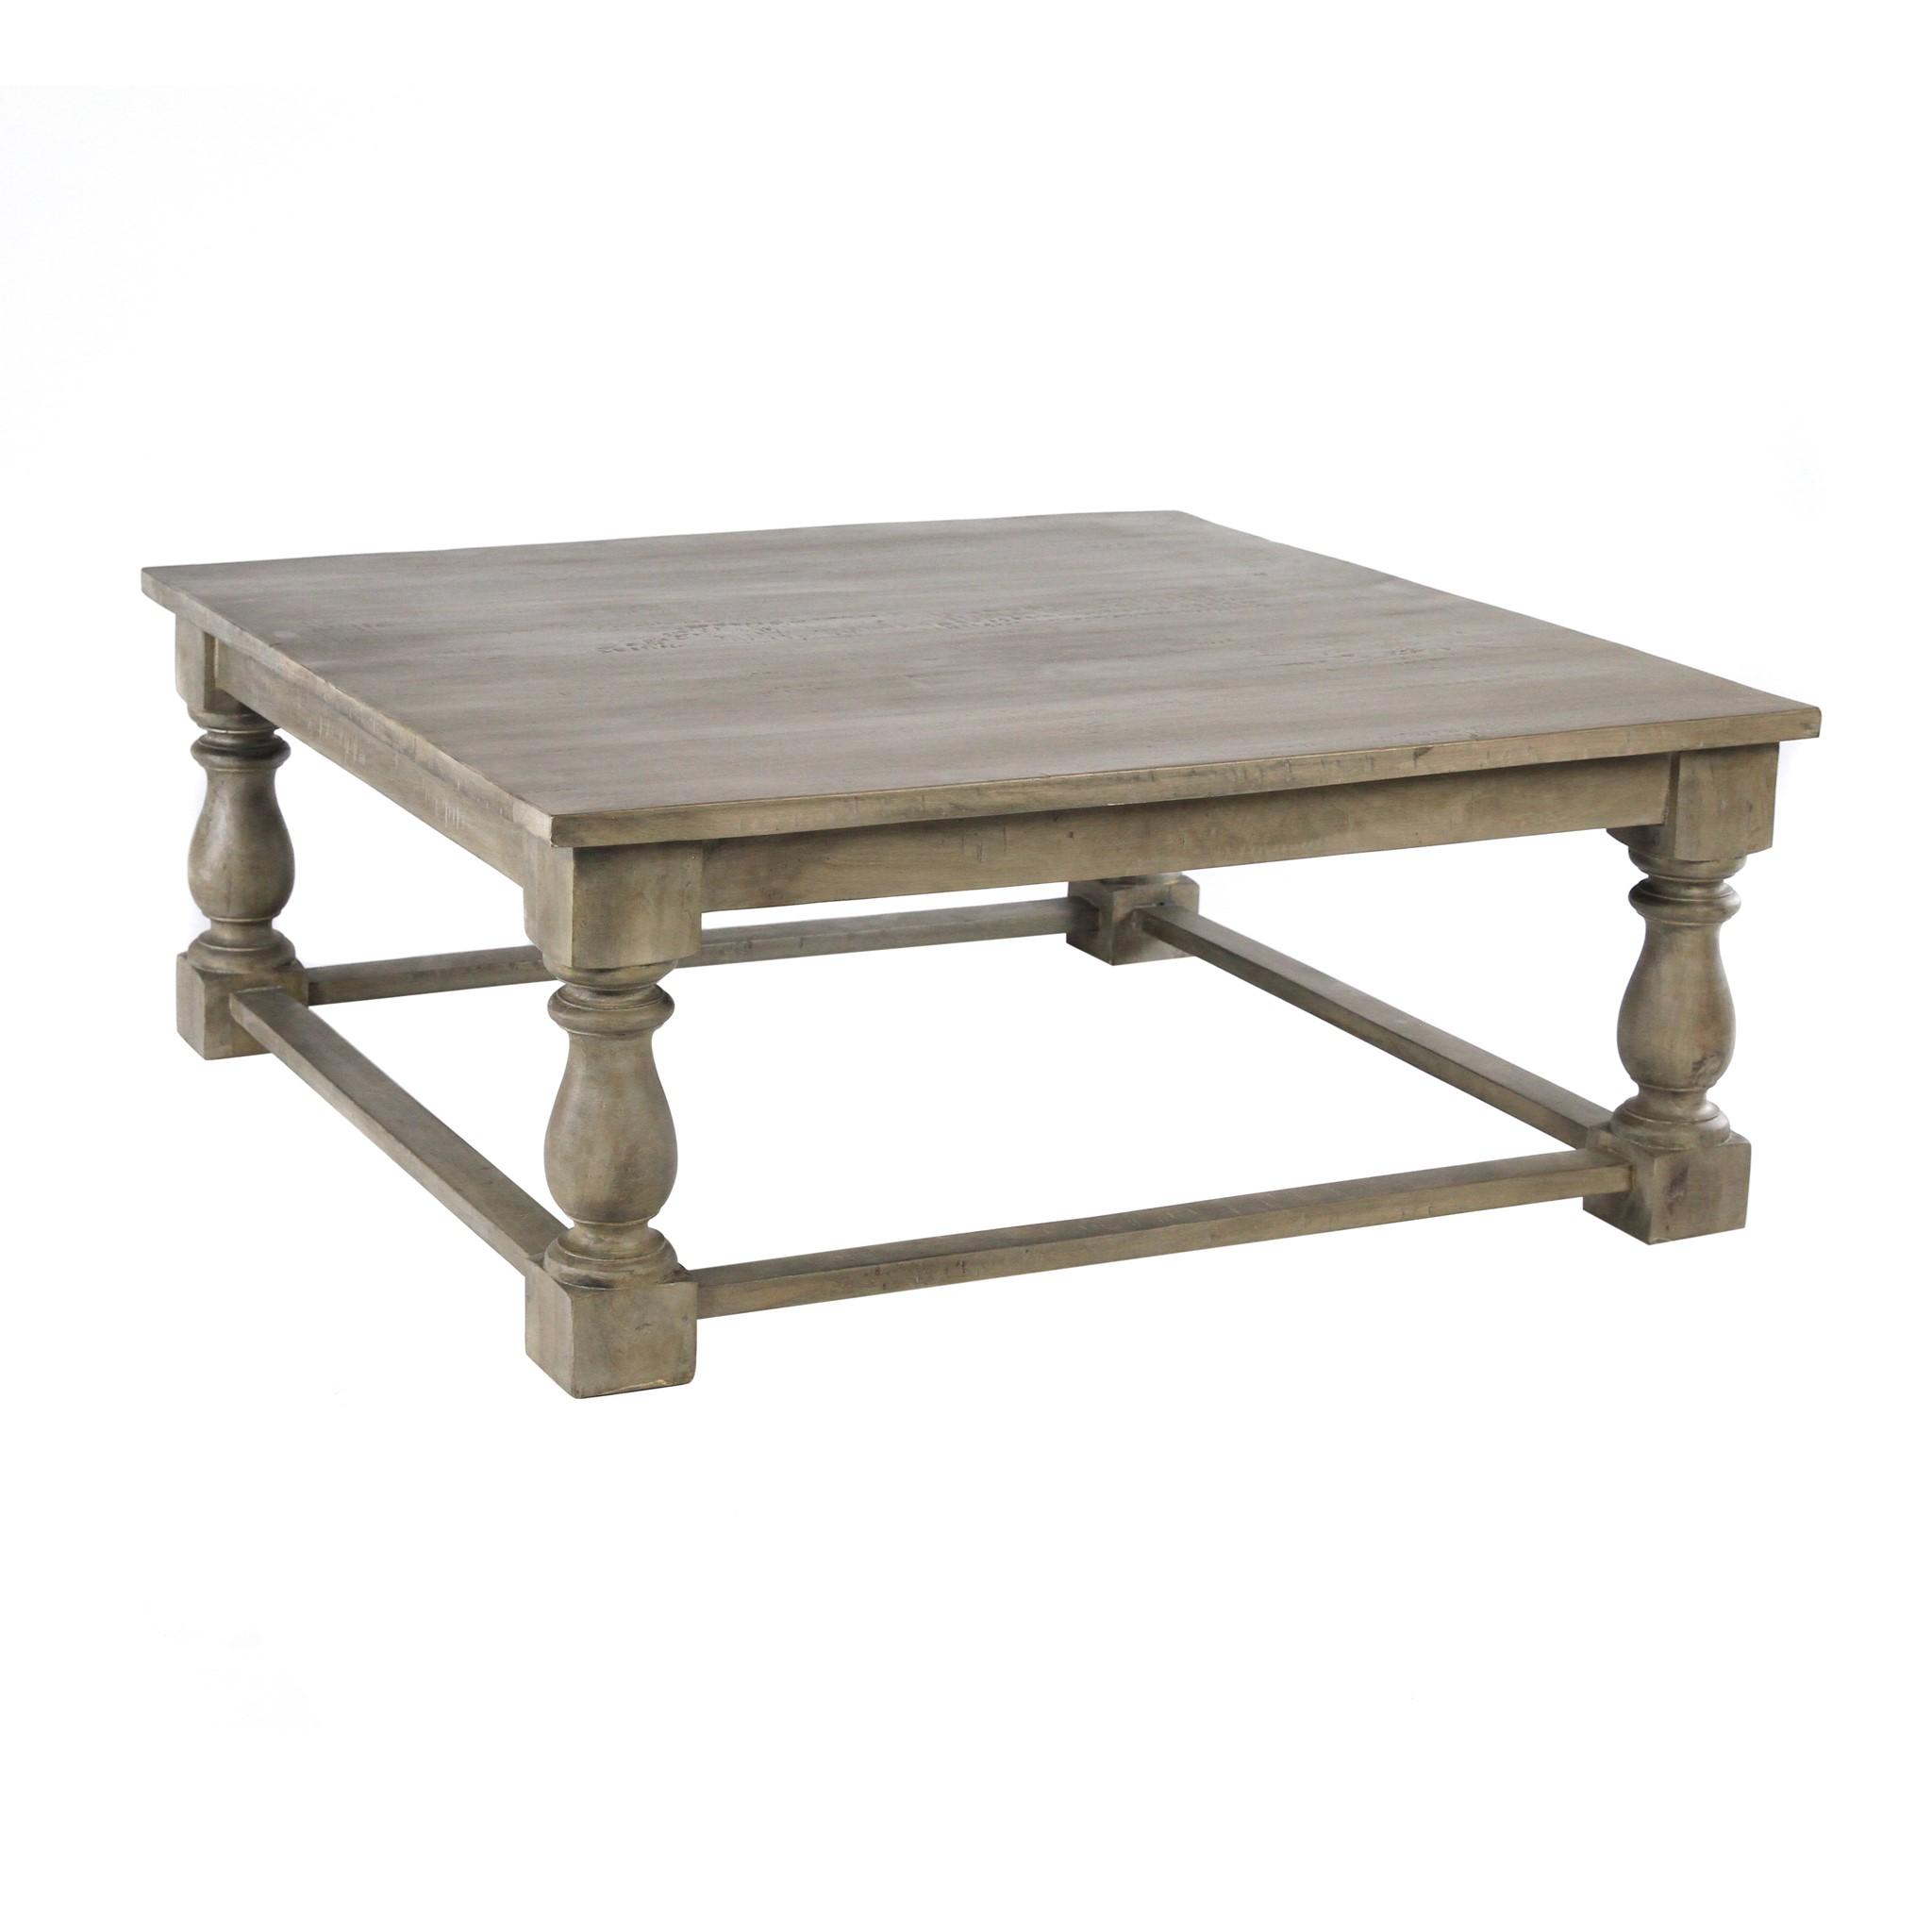 Bluster Leg Coffee Table 48x48x20 SAL